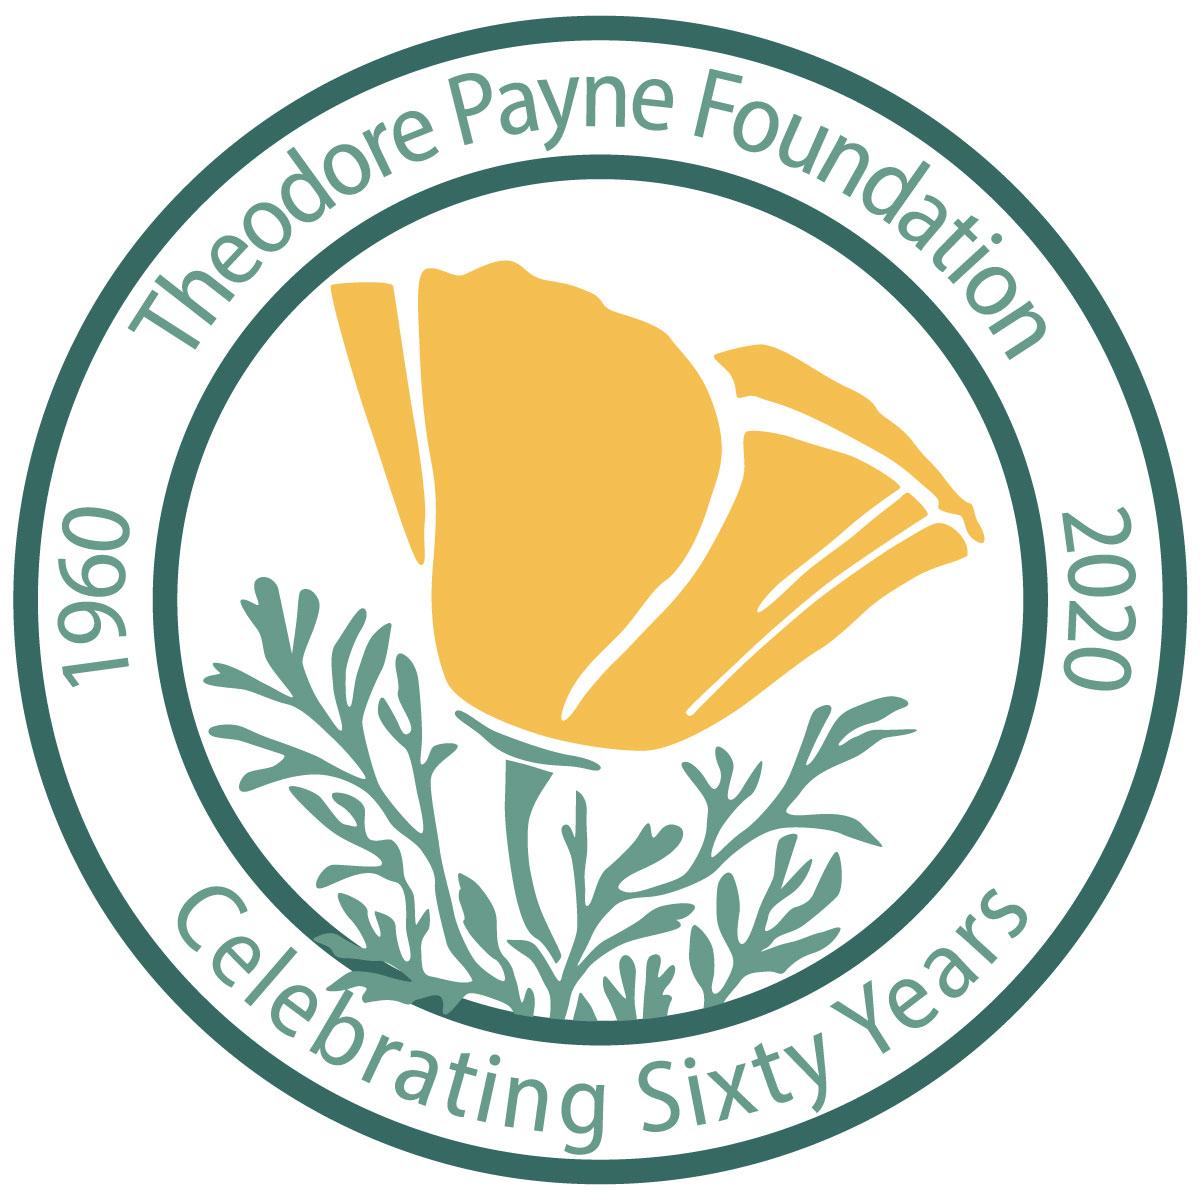 Theodore Payne Foundation